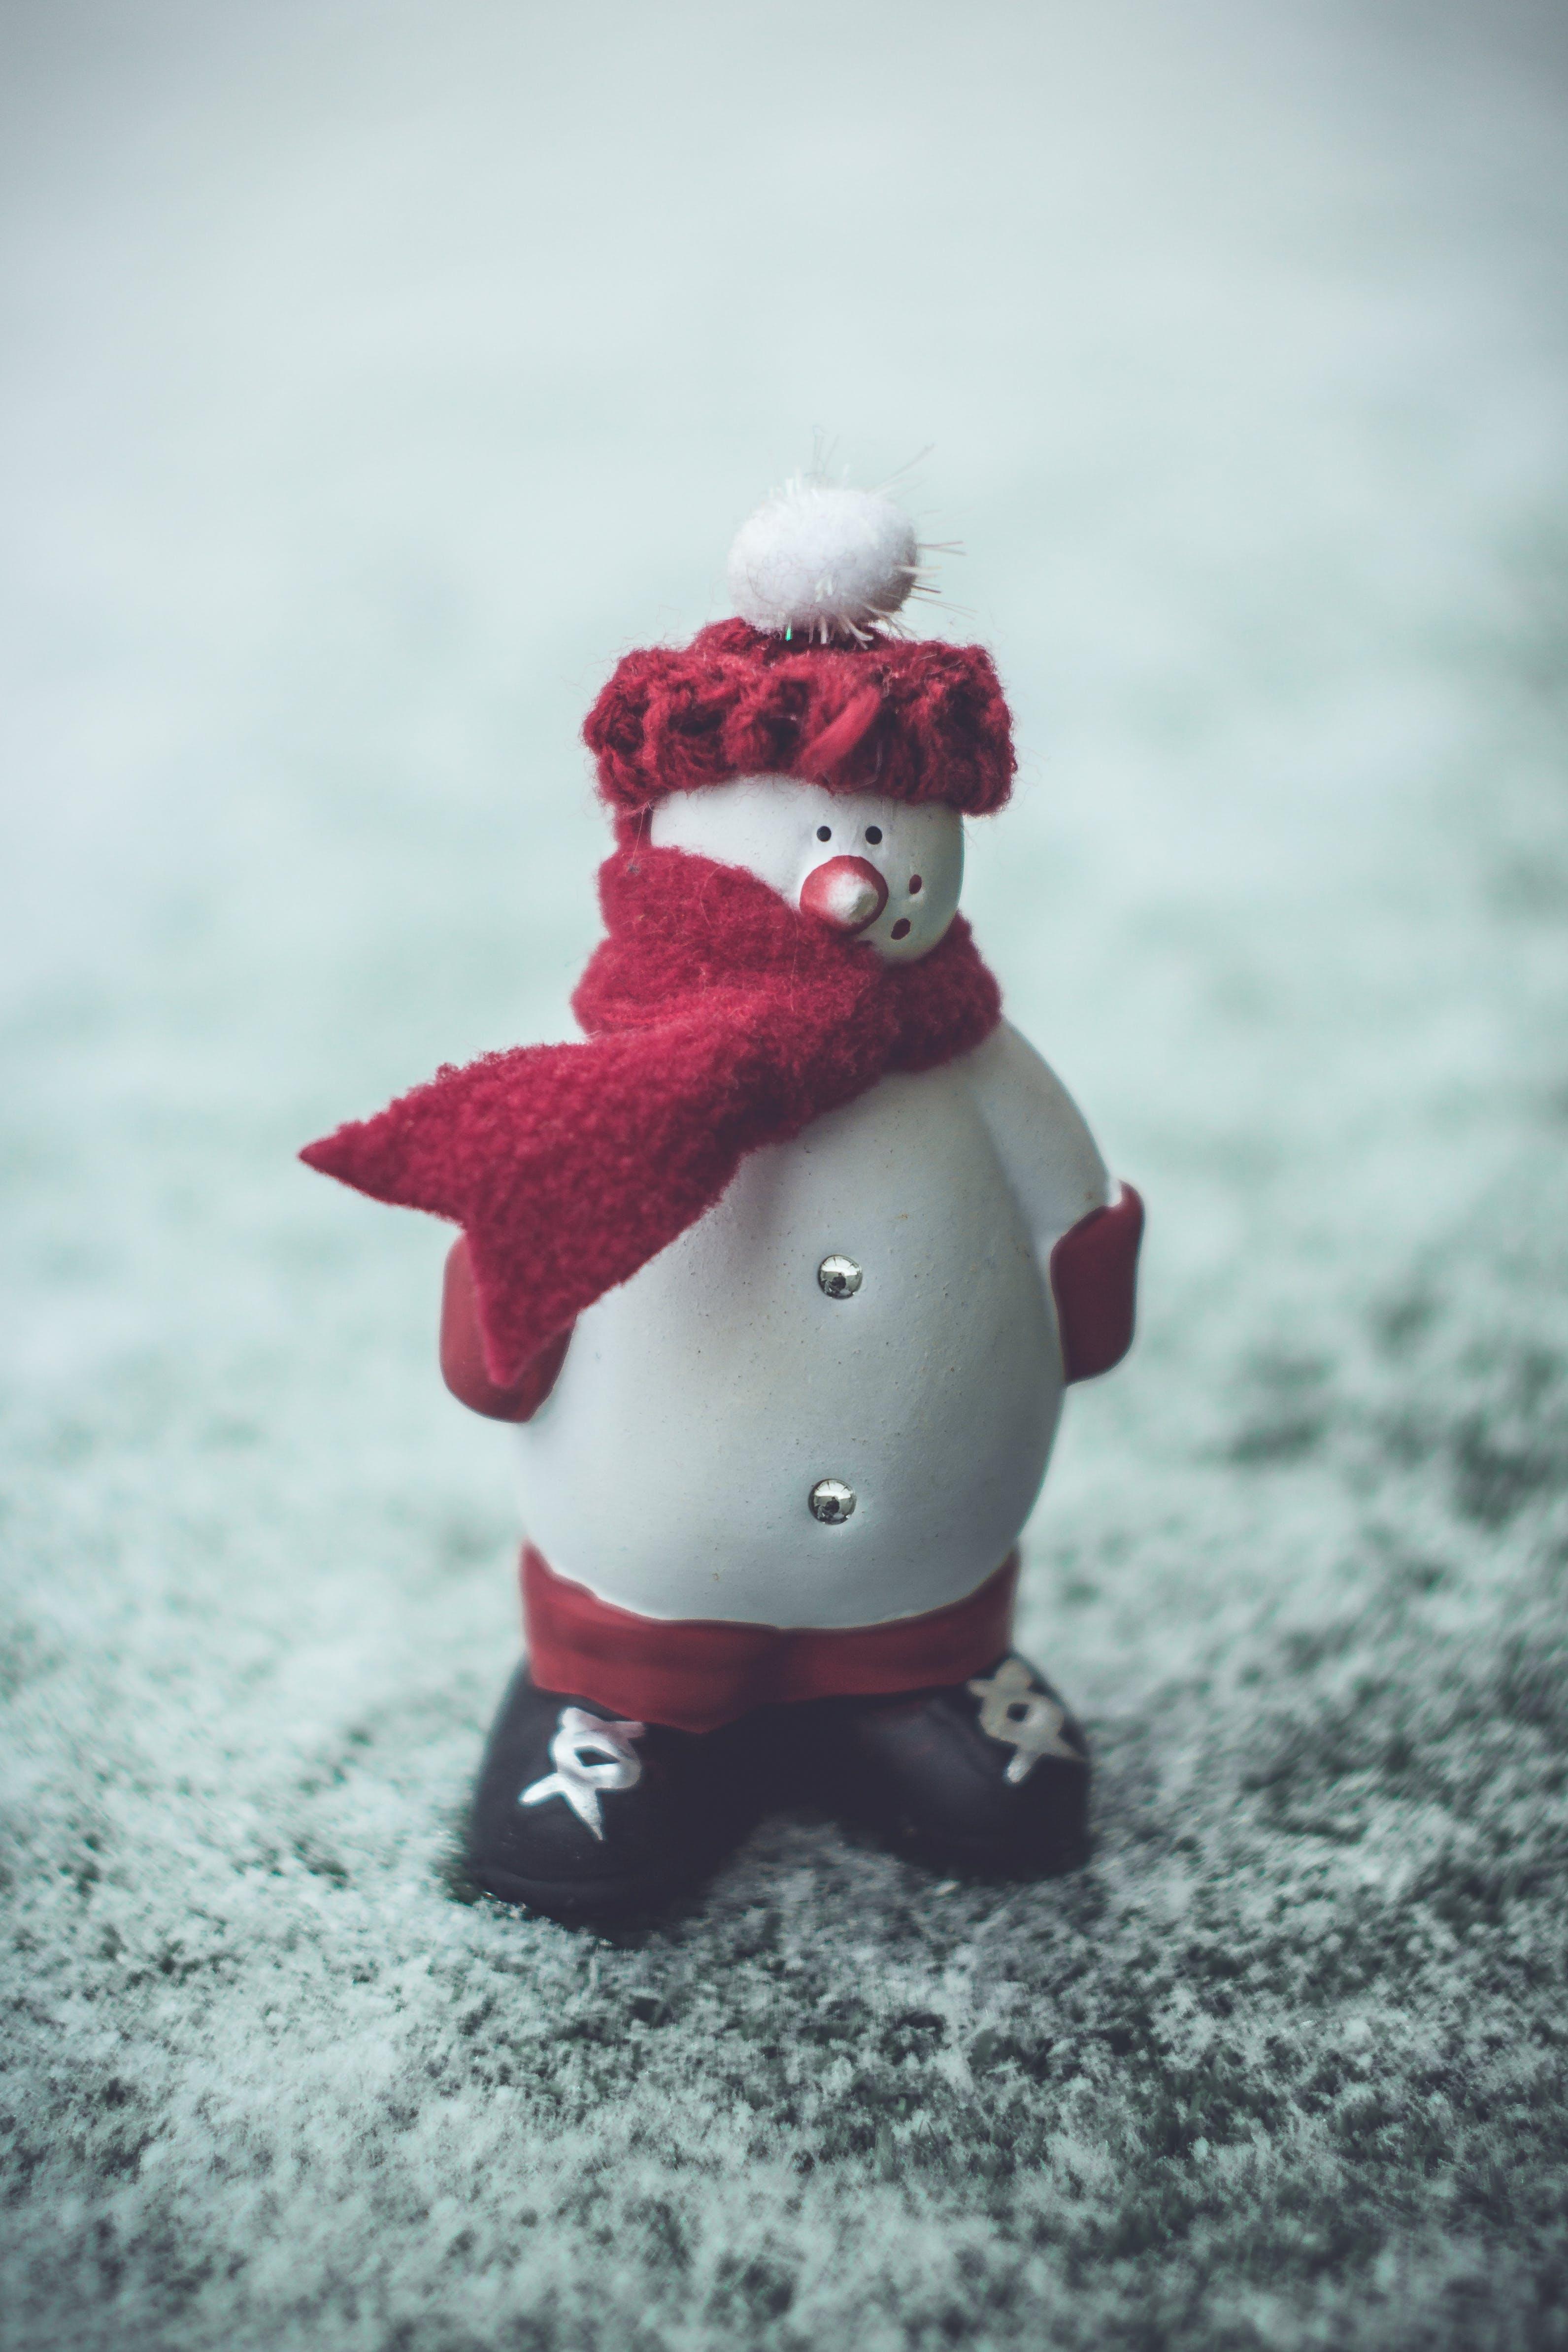 Free stock photo of winter, grass, christmas, figure